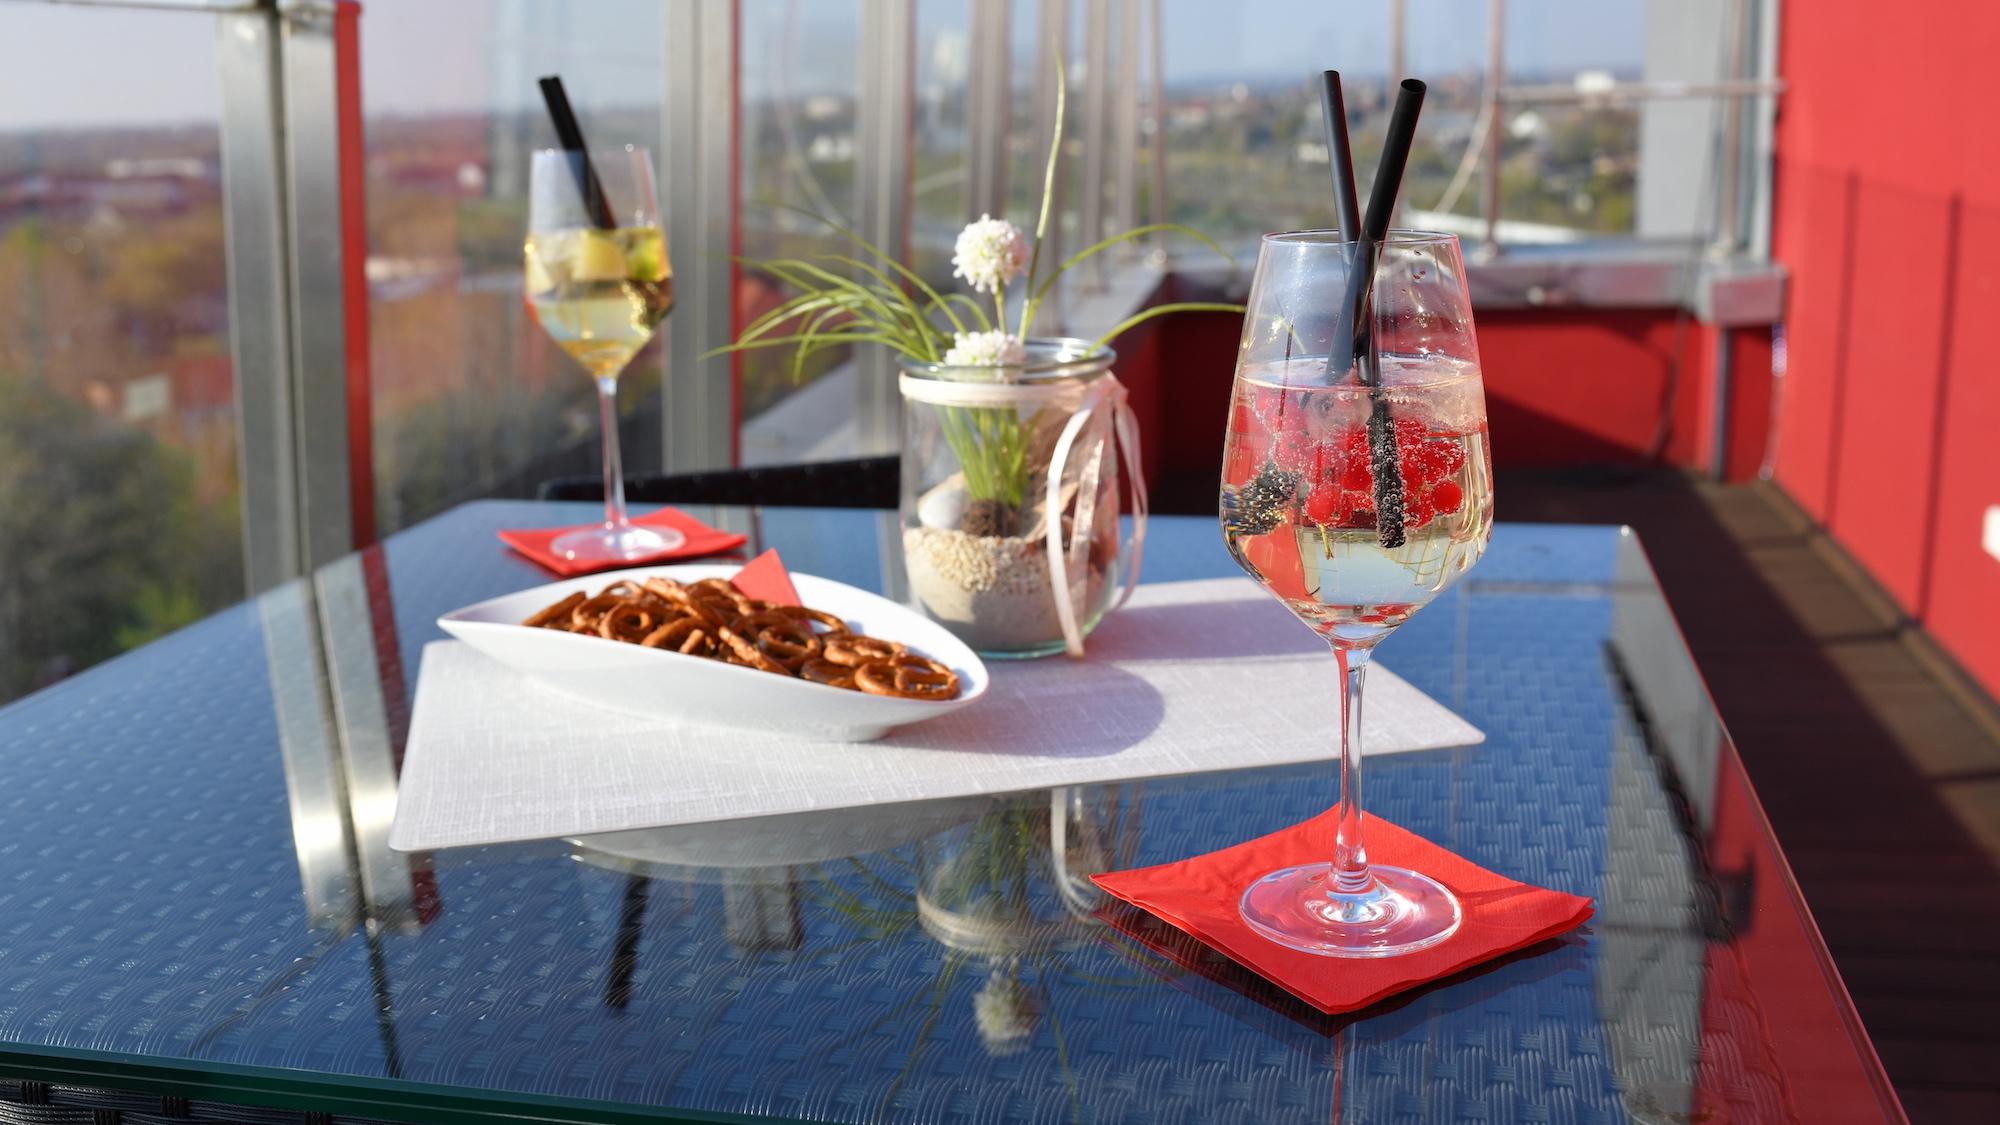 höchstes Restaurant Sachsen anhält rabennest merseburg Skyhotel